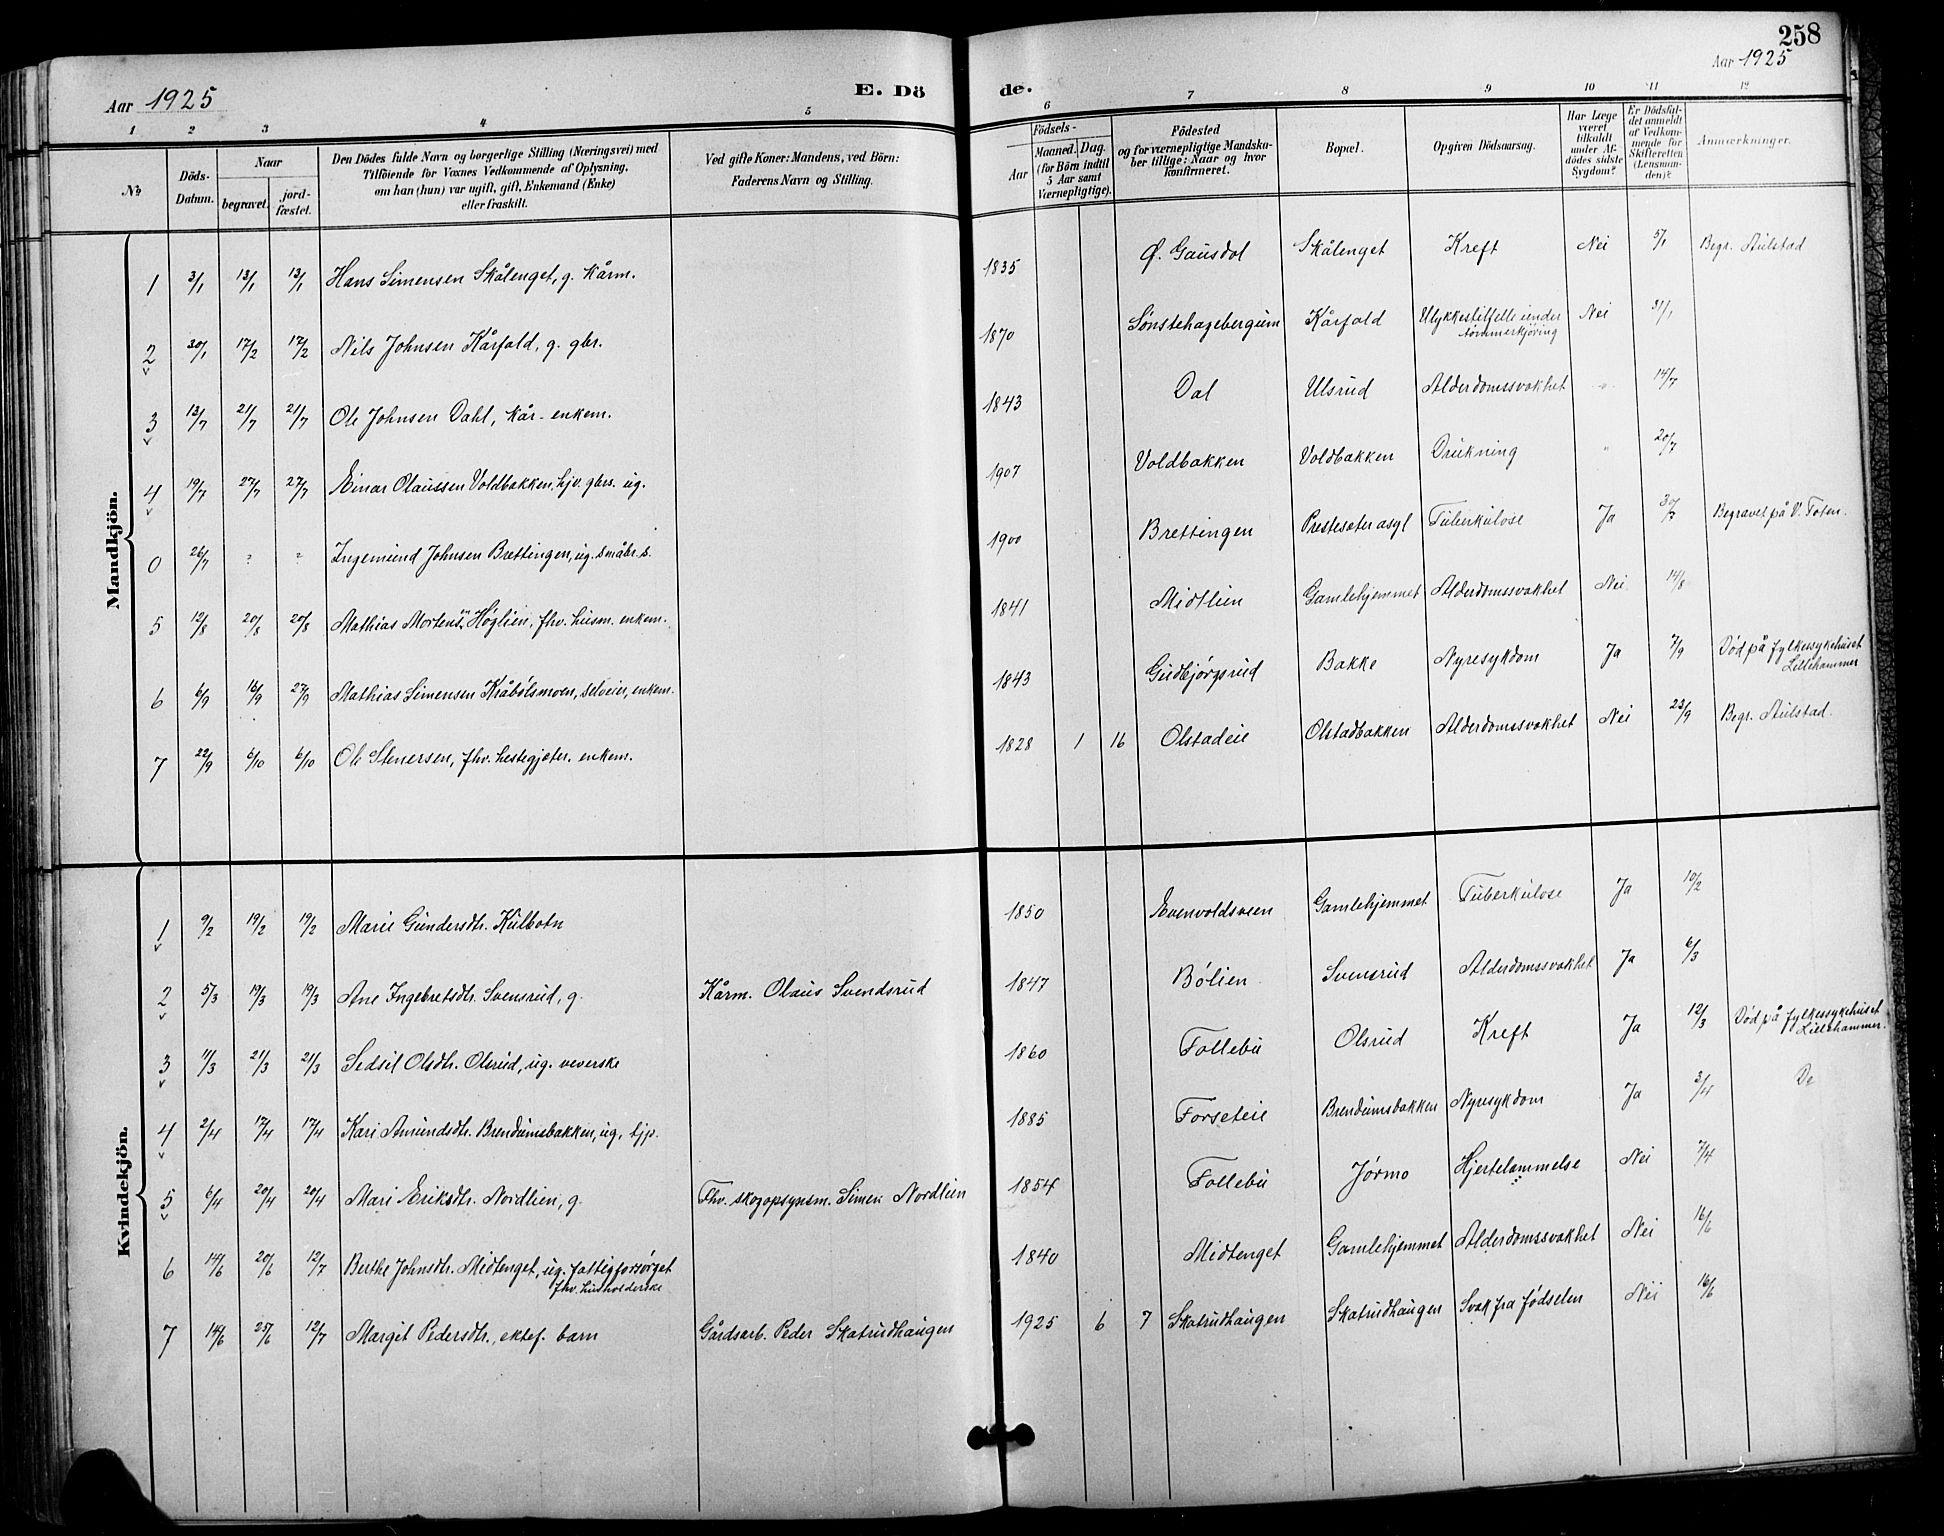 SAH, Vestre Gausdal prestekontor, Klokkerbok nr. 3, 1896-1925, s. 258